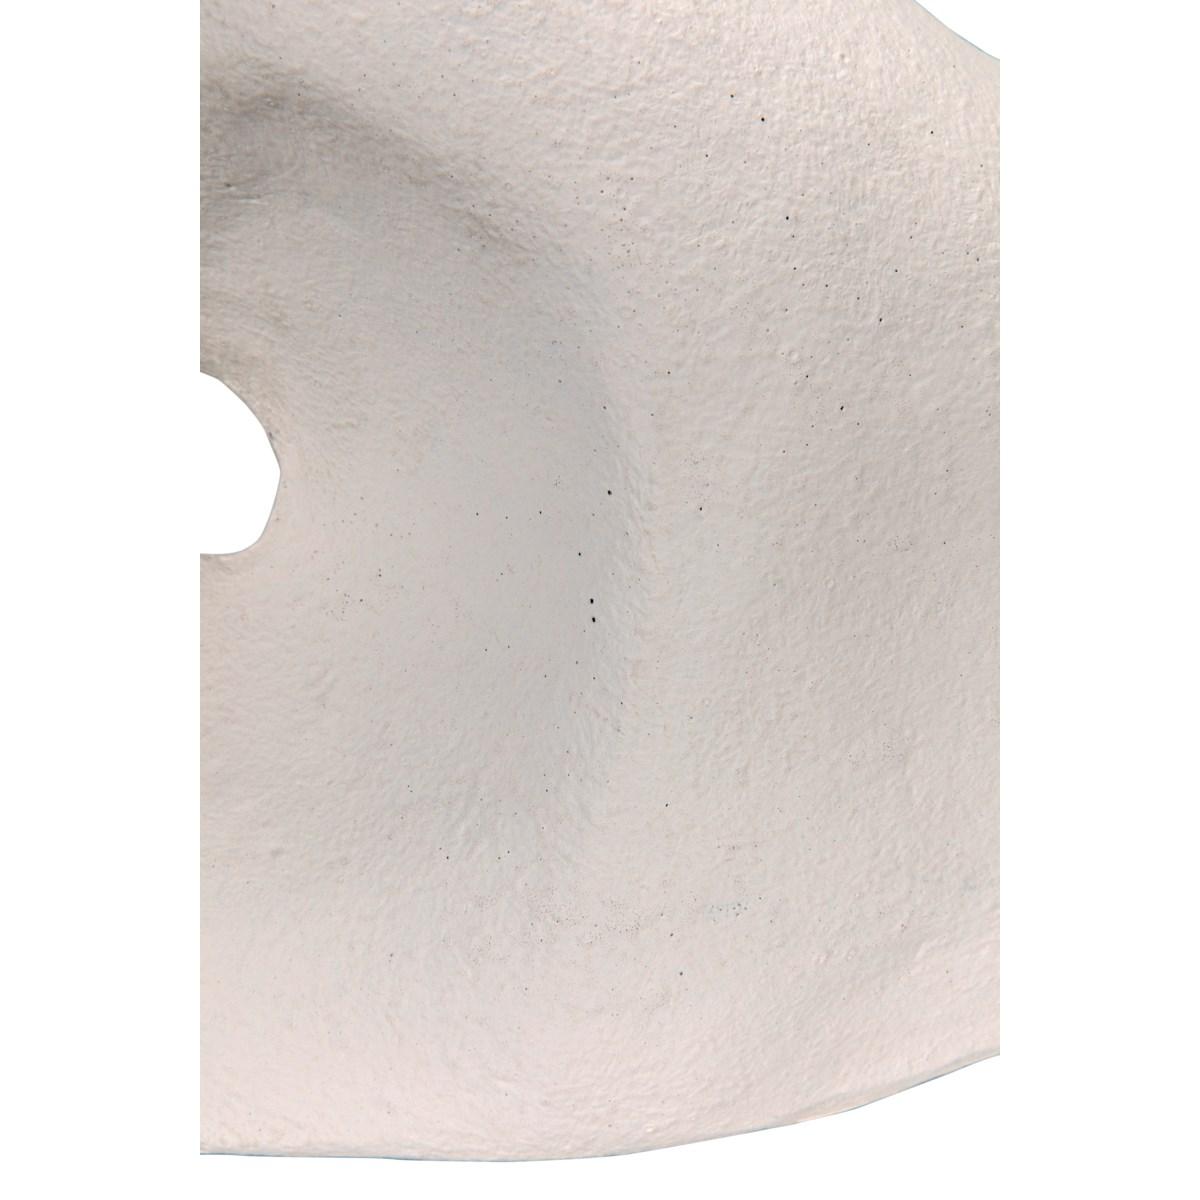 Calatrava Object, White Fiber Cement